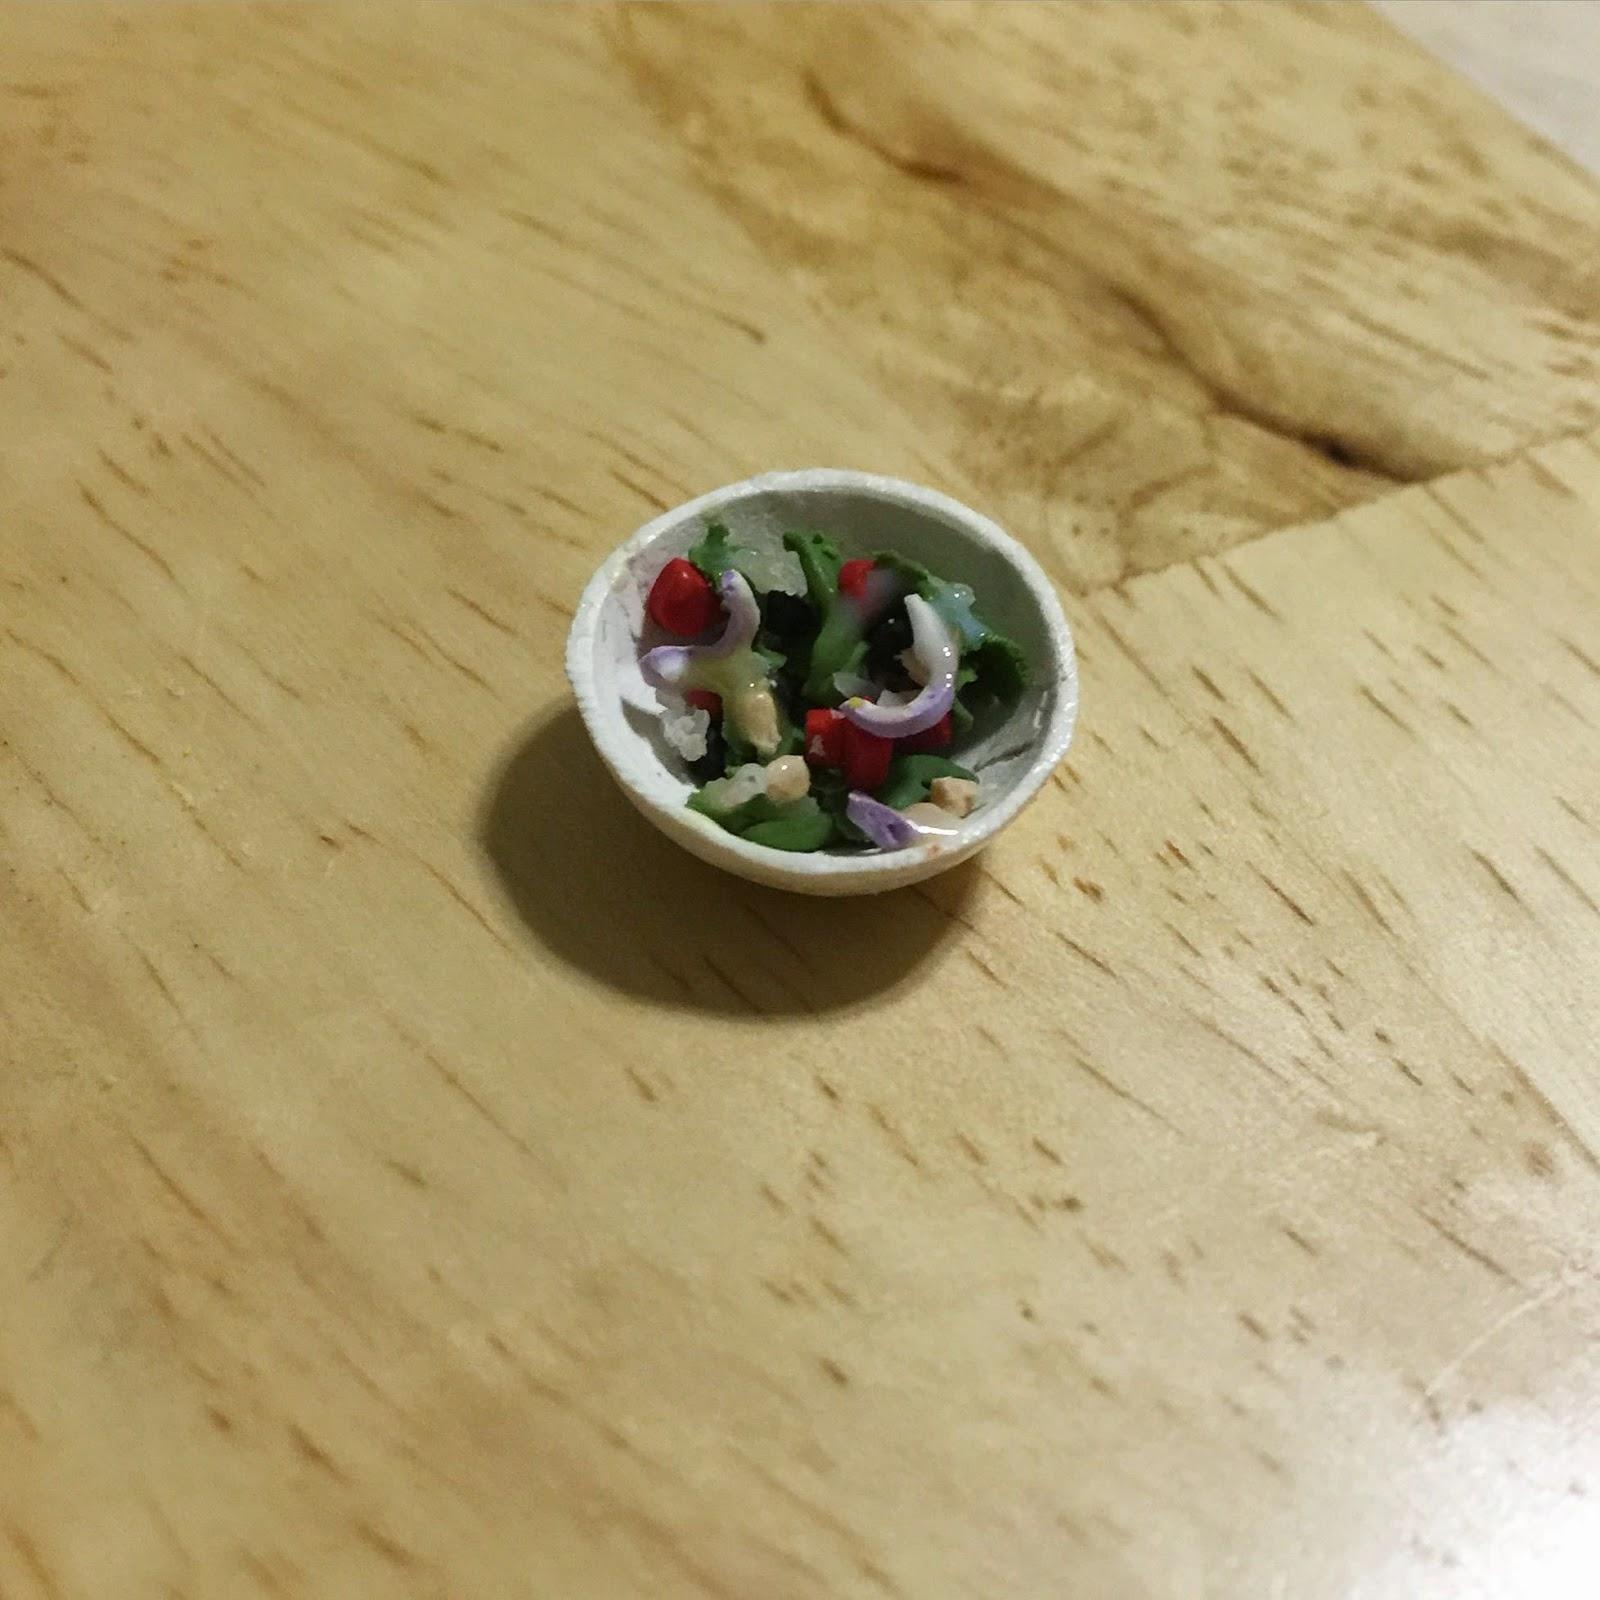 Tiny Salad